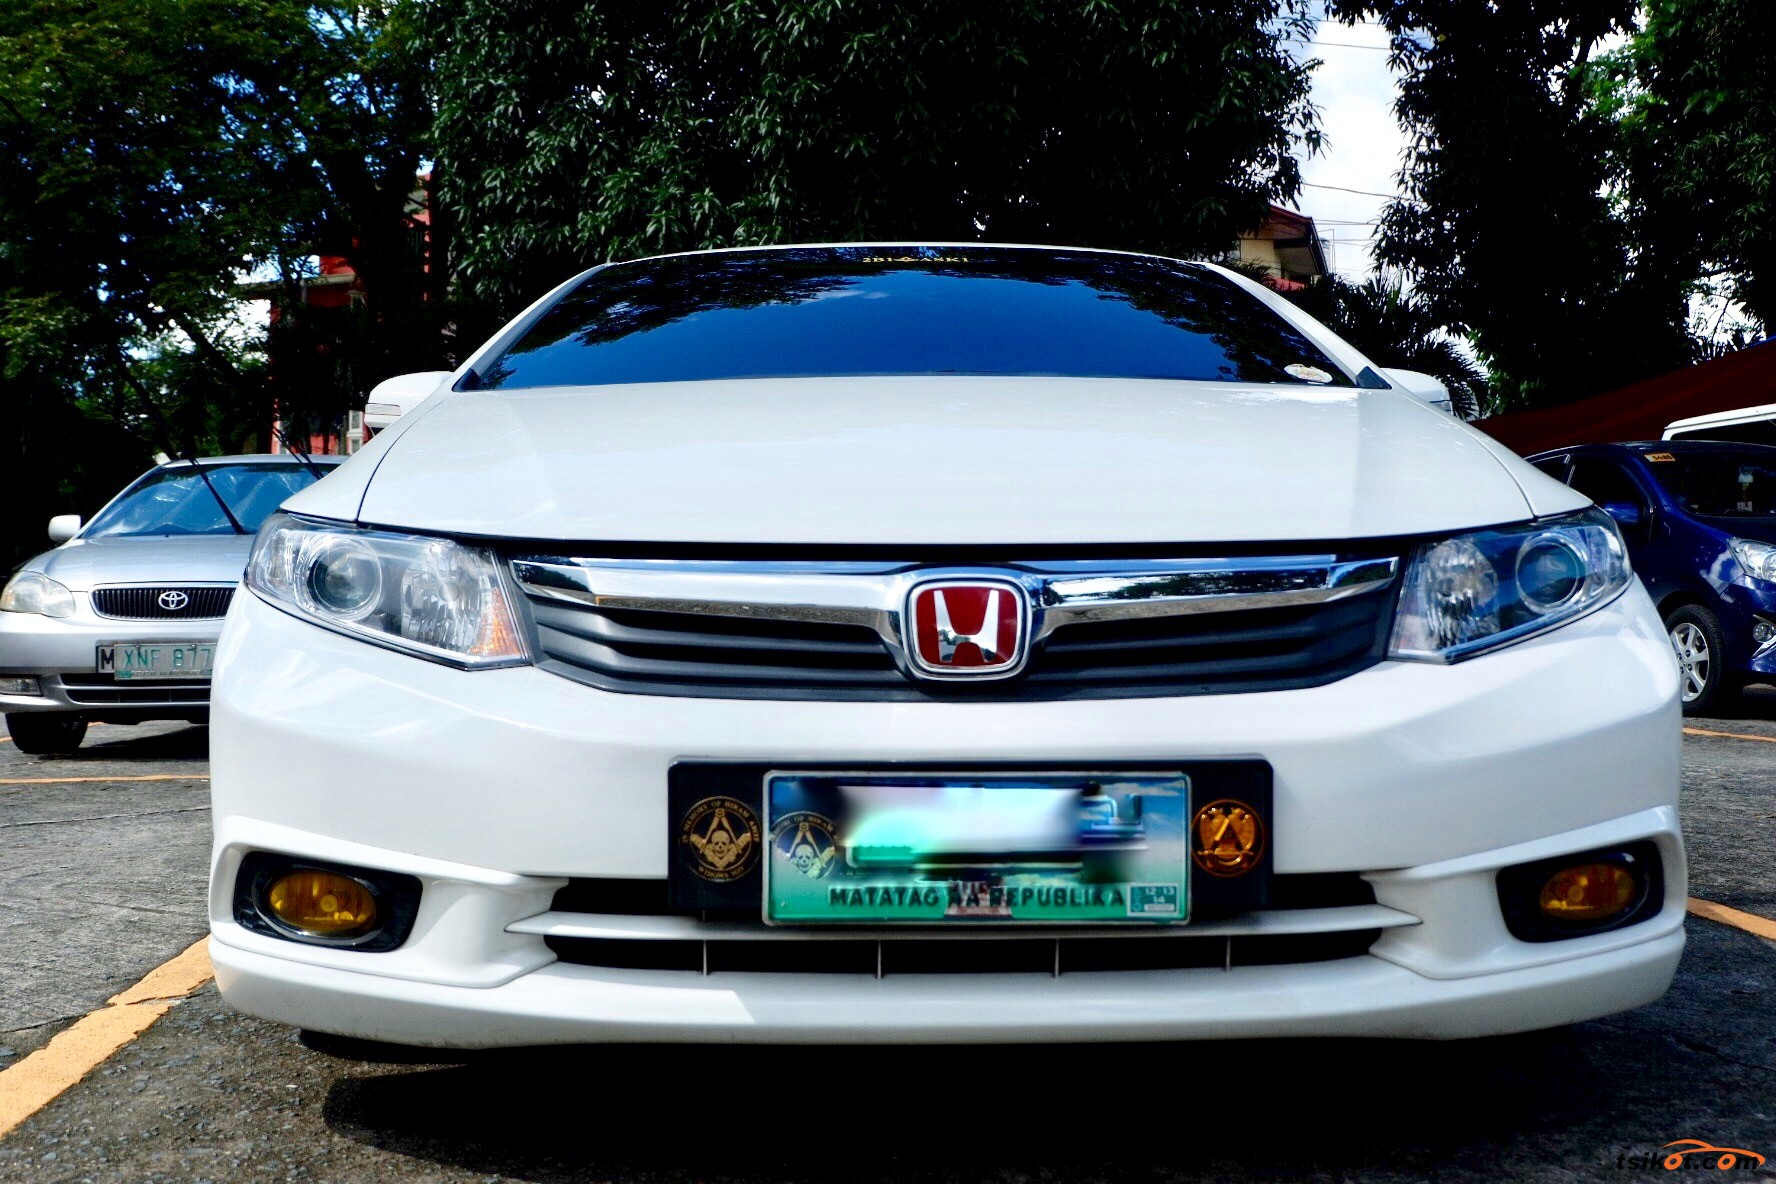 Honda Civic 2012 - Car for Sale Metro Manila